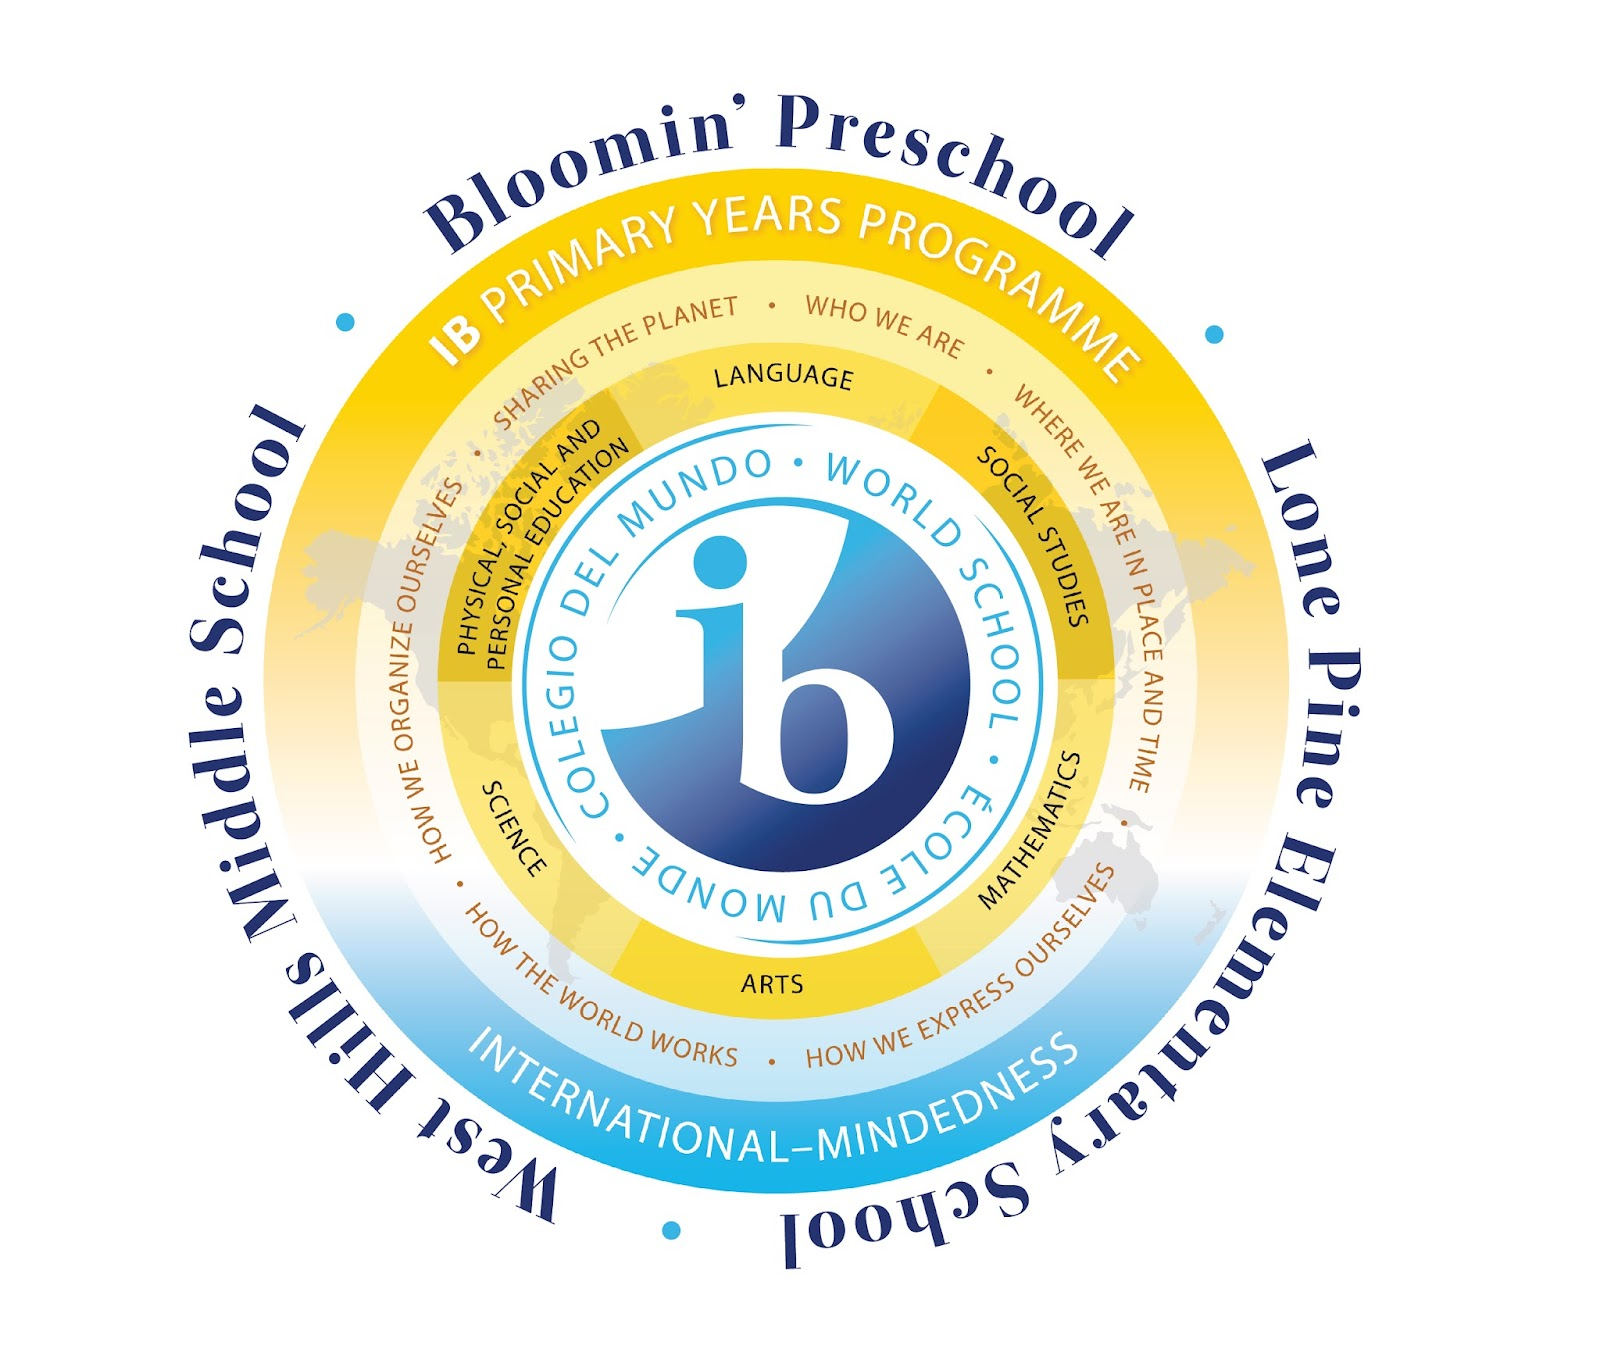 pyp-logo-bhs.jpg